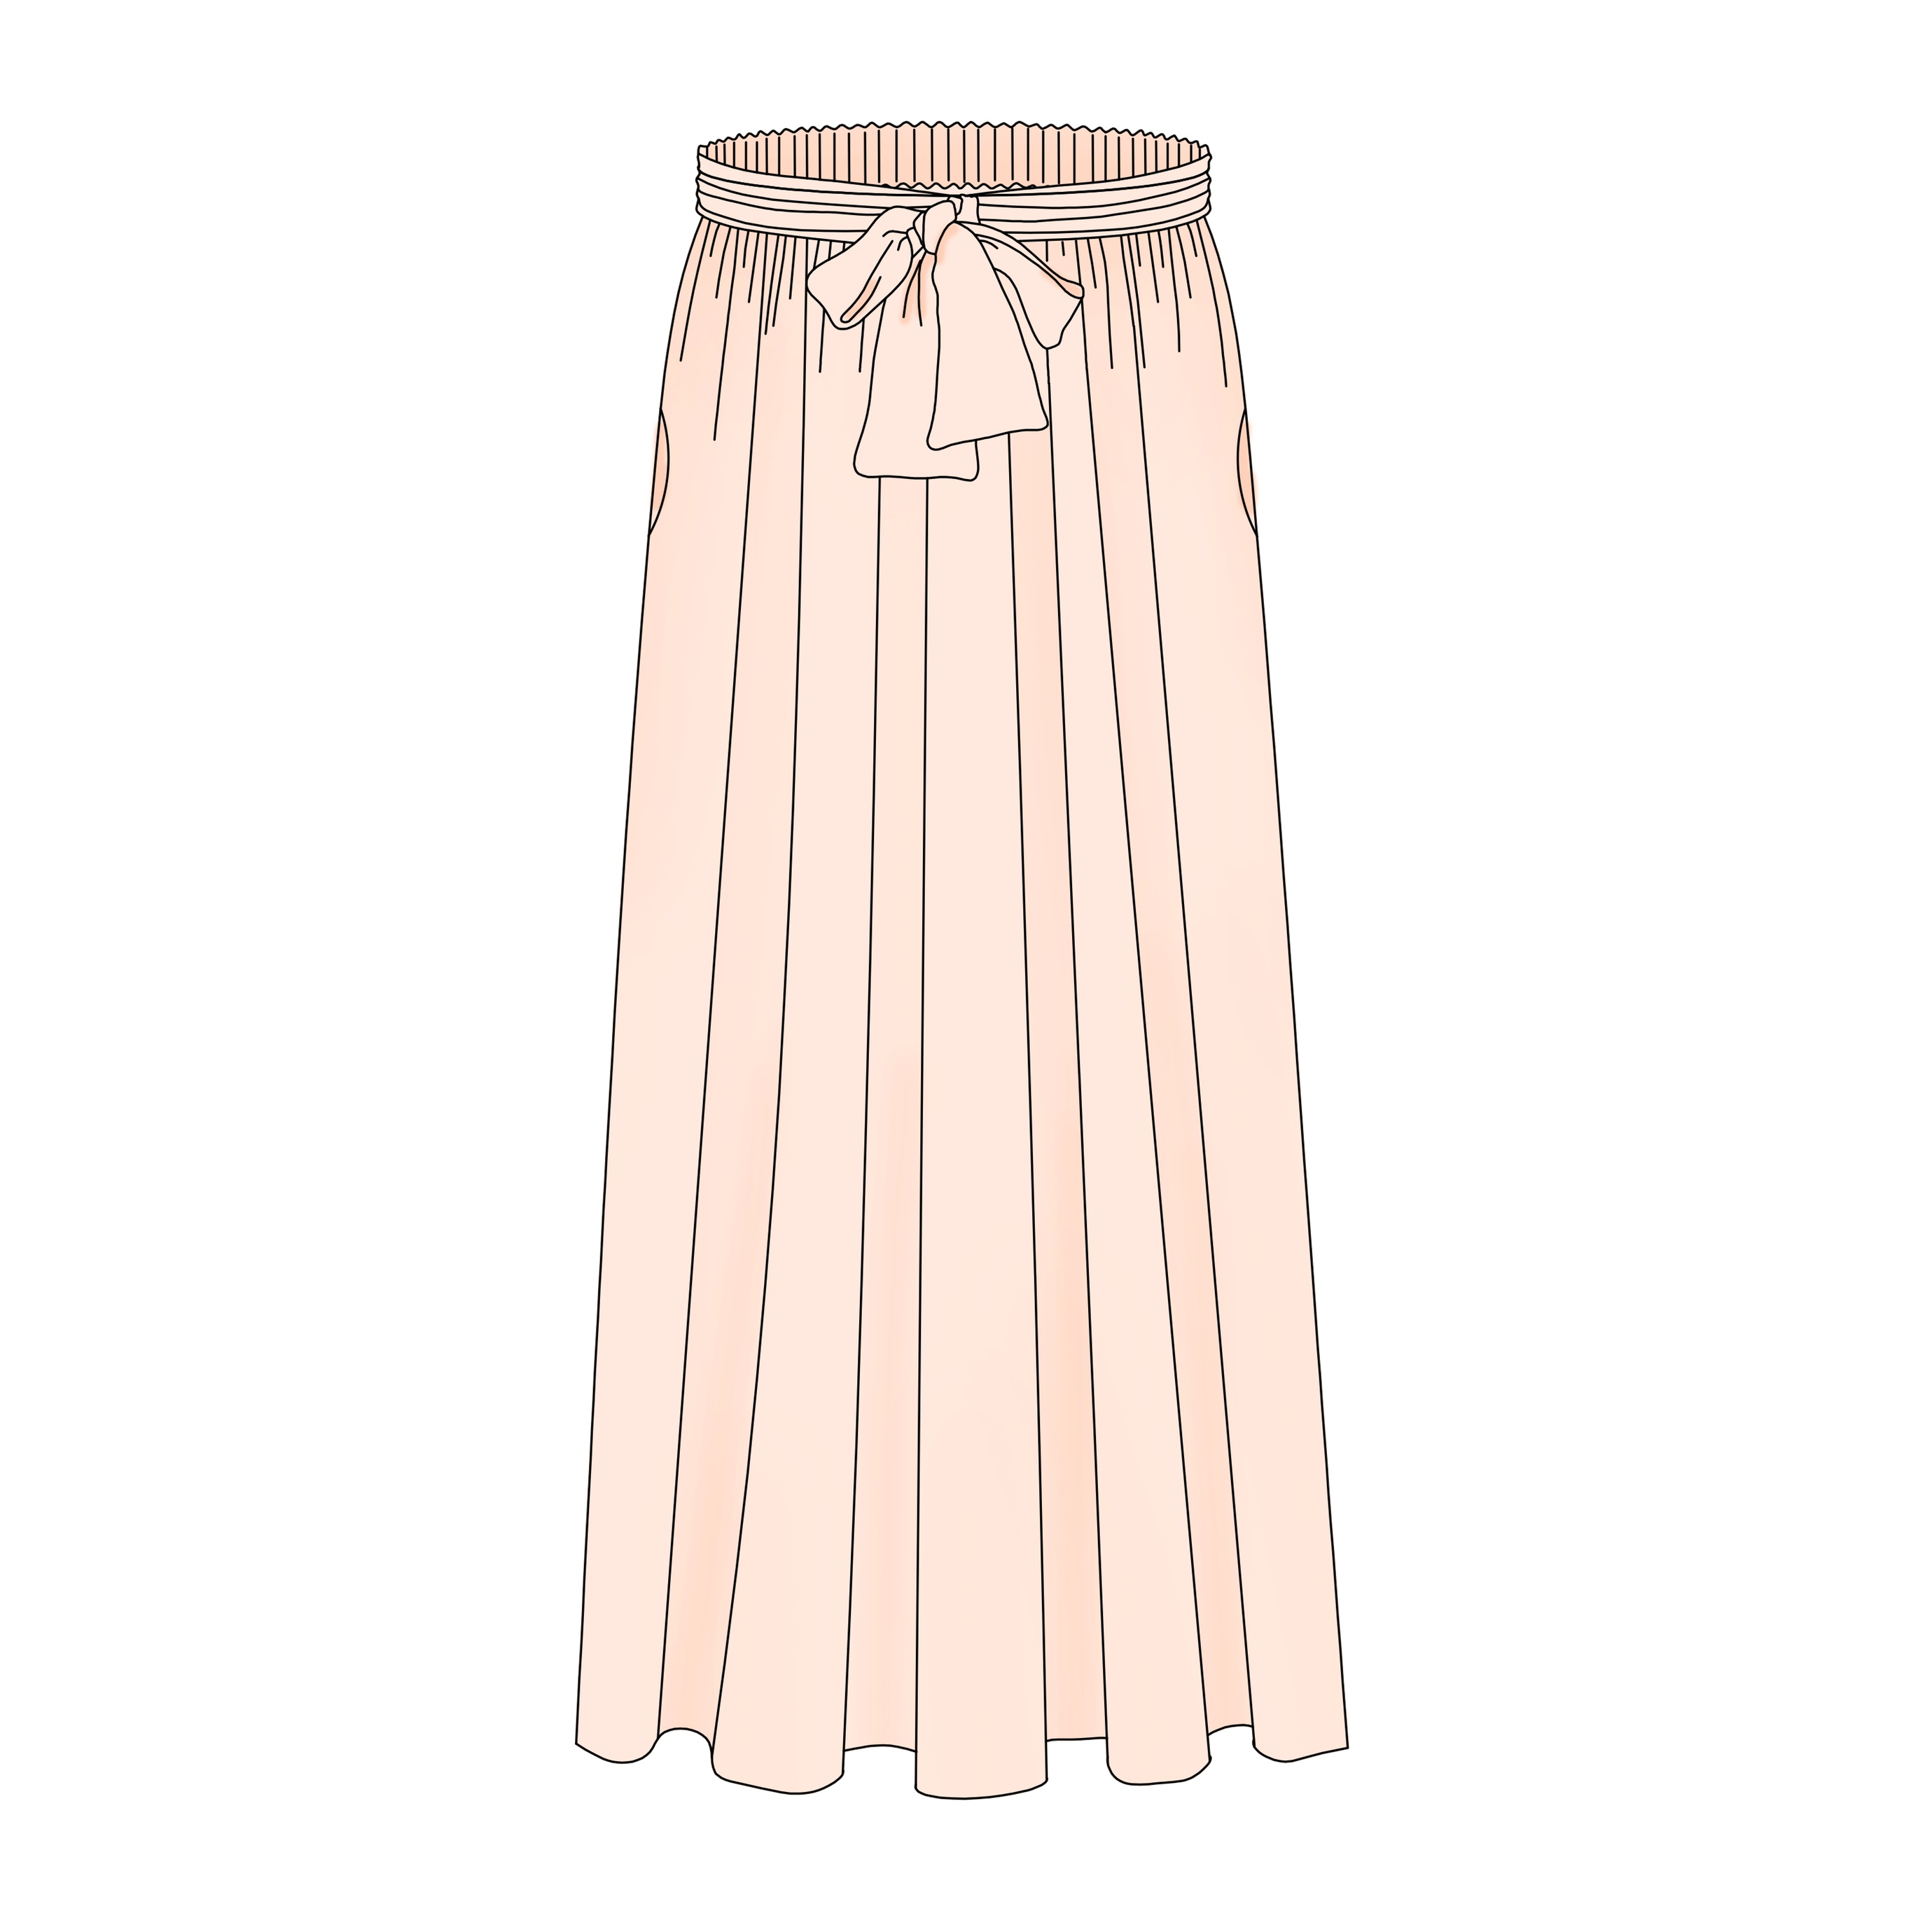 598a343805af86 Pastel - la jupe longue - FR/EN